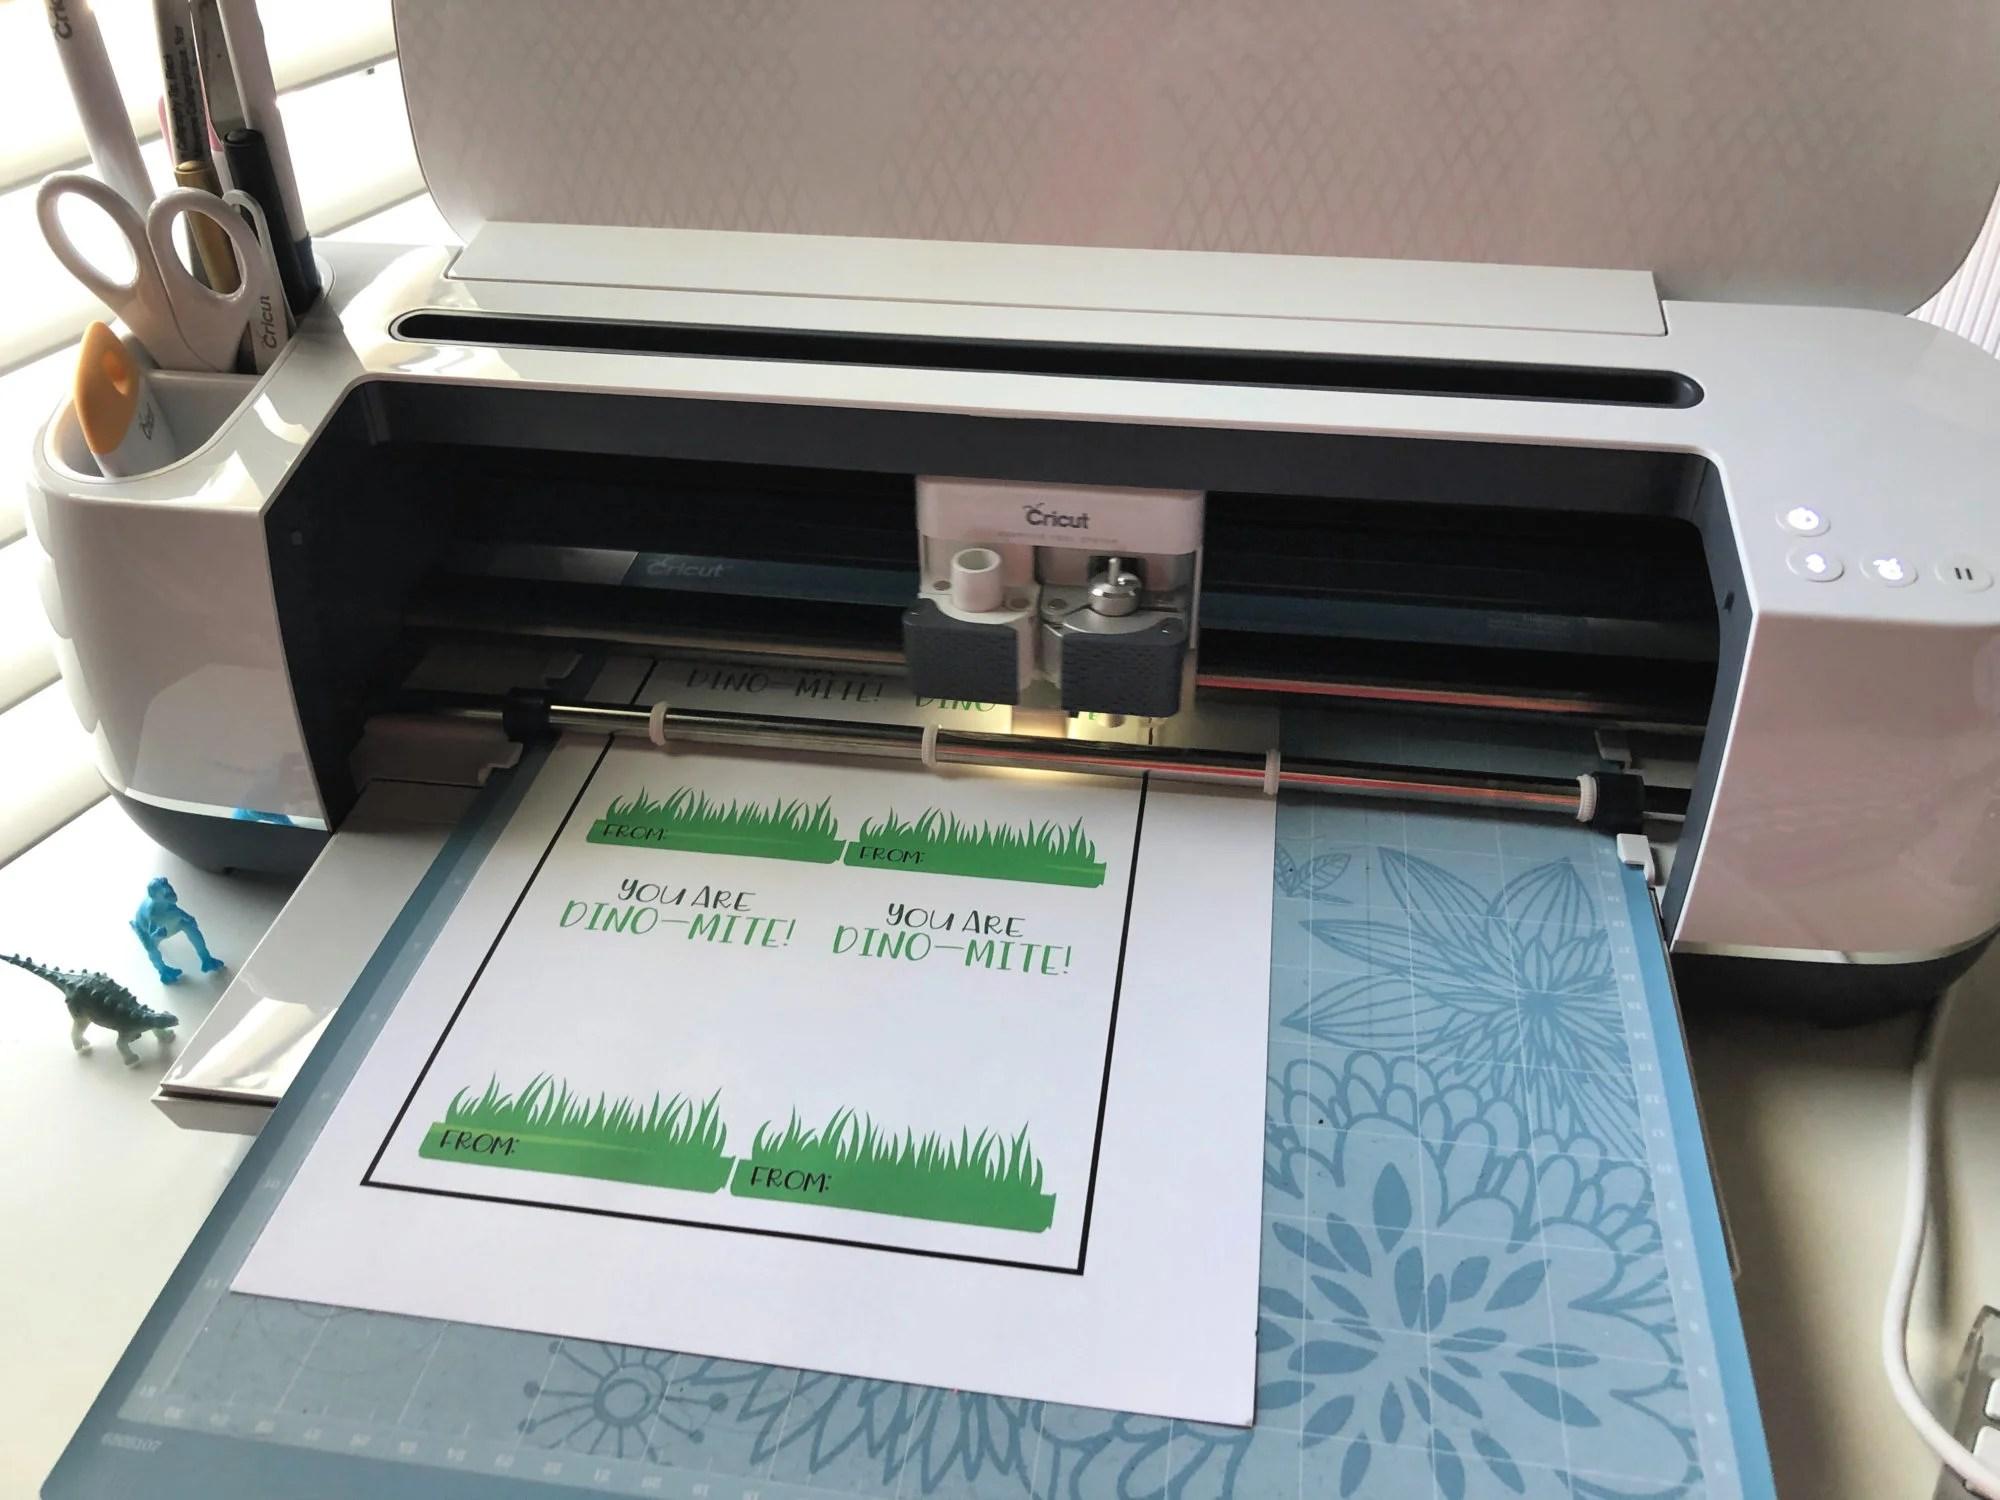 Dino-Mite Print Then Cut with Cricut Maker